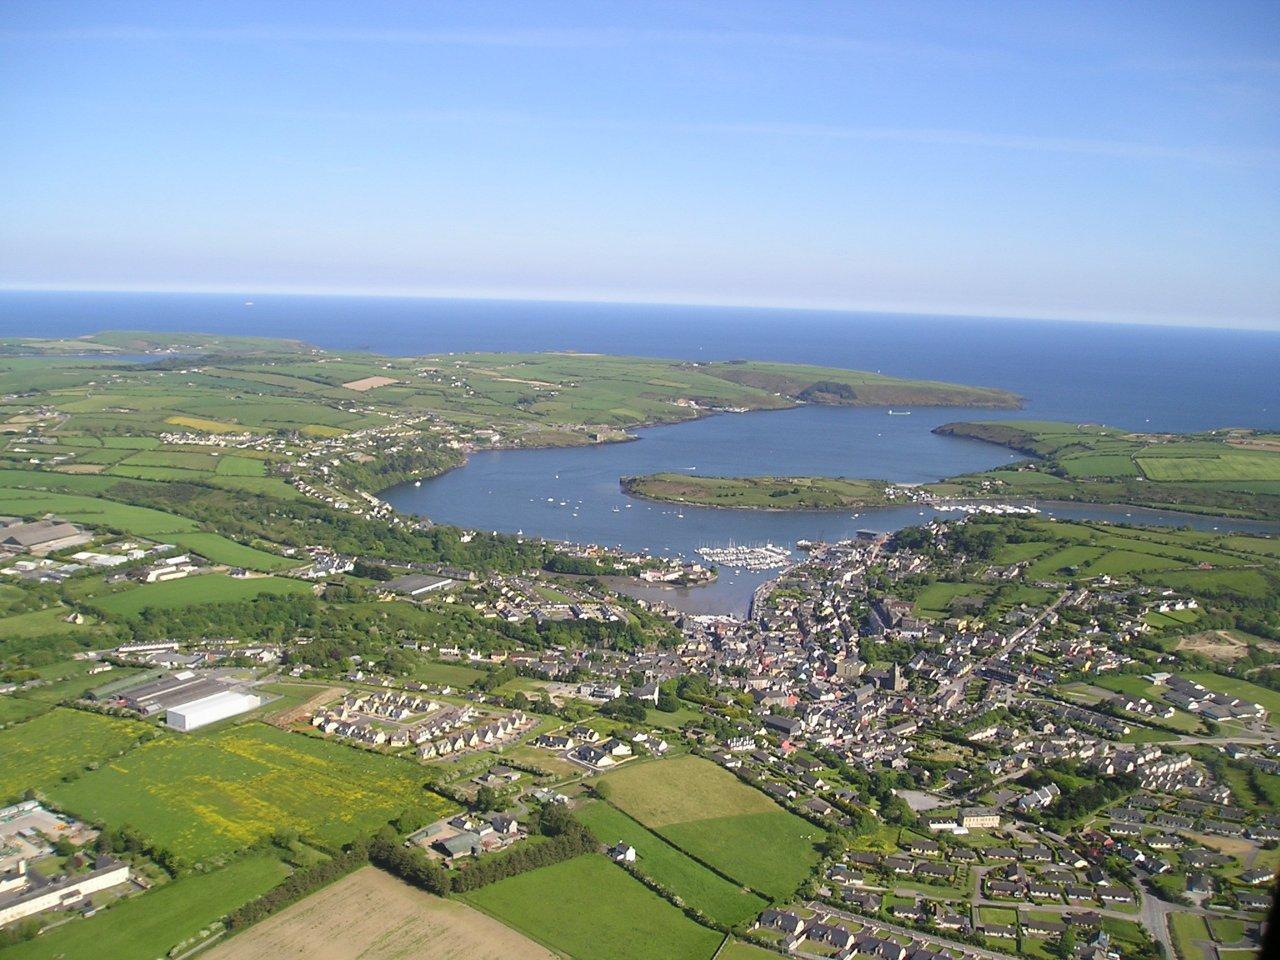 Kinsale to Clonakilty Scenic Drive, Co. Cork, Irelands Wild Atlantic Way